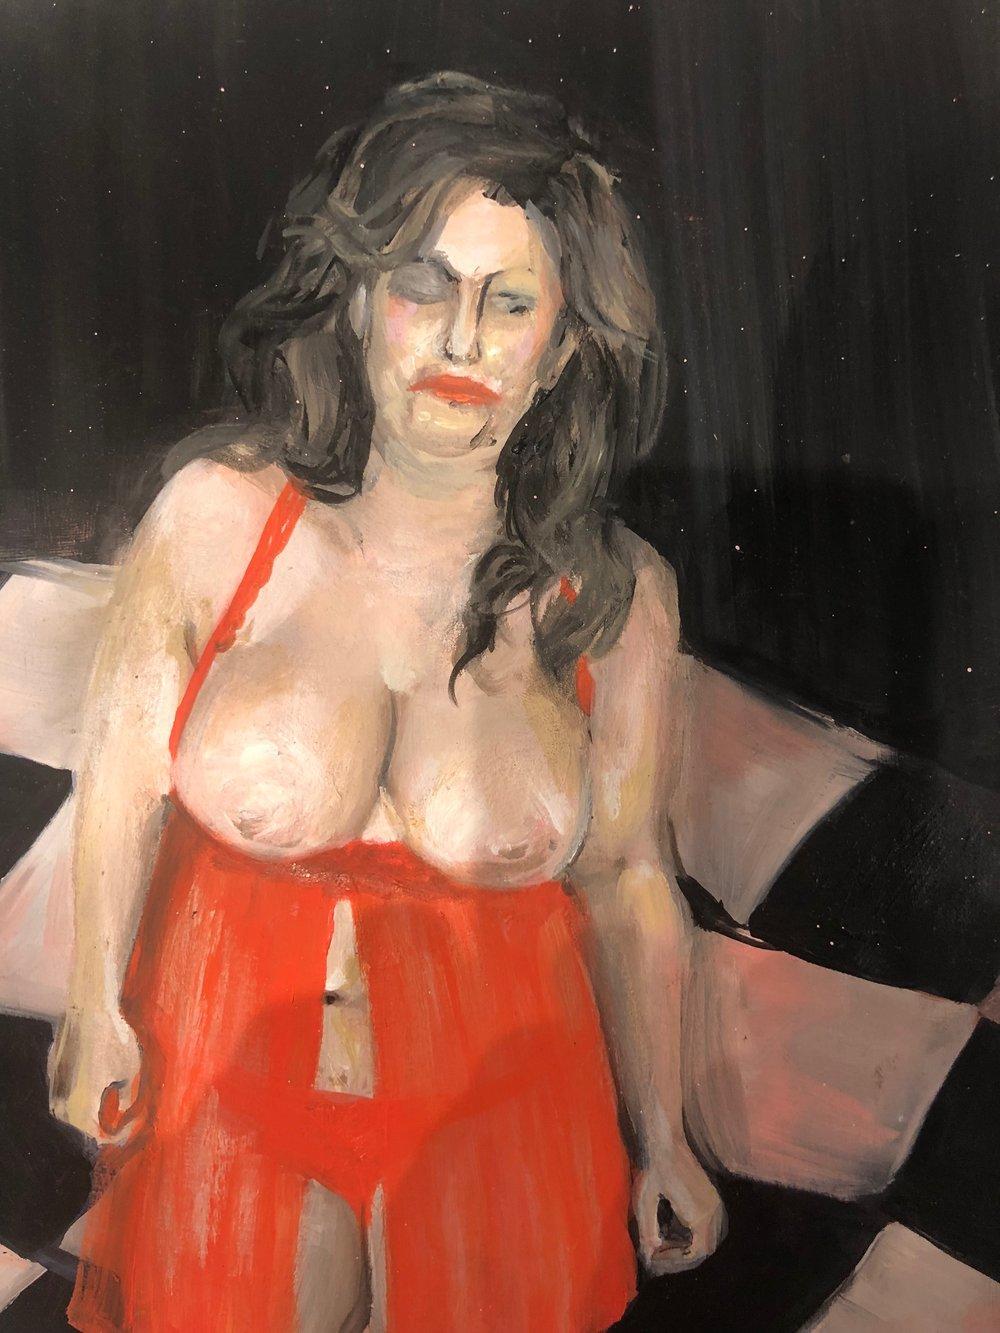 Lara Nasser, Lump , 2018, oil on panel, 10 x 8 inches